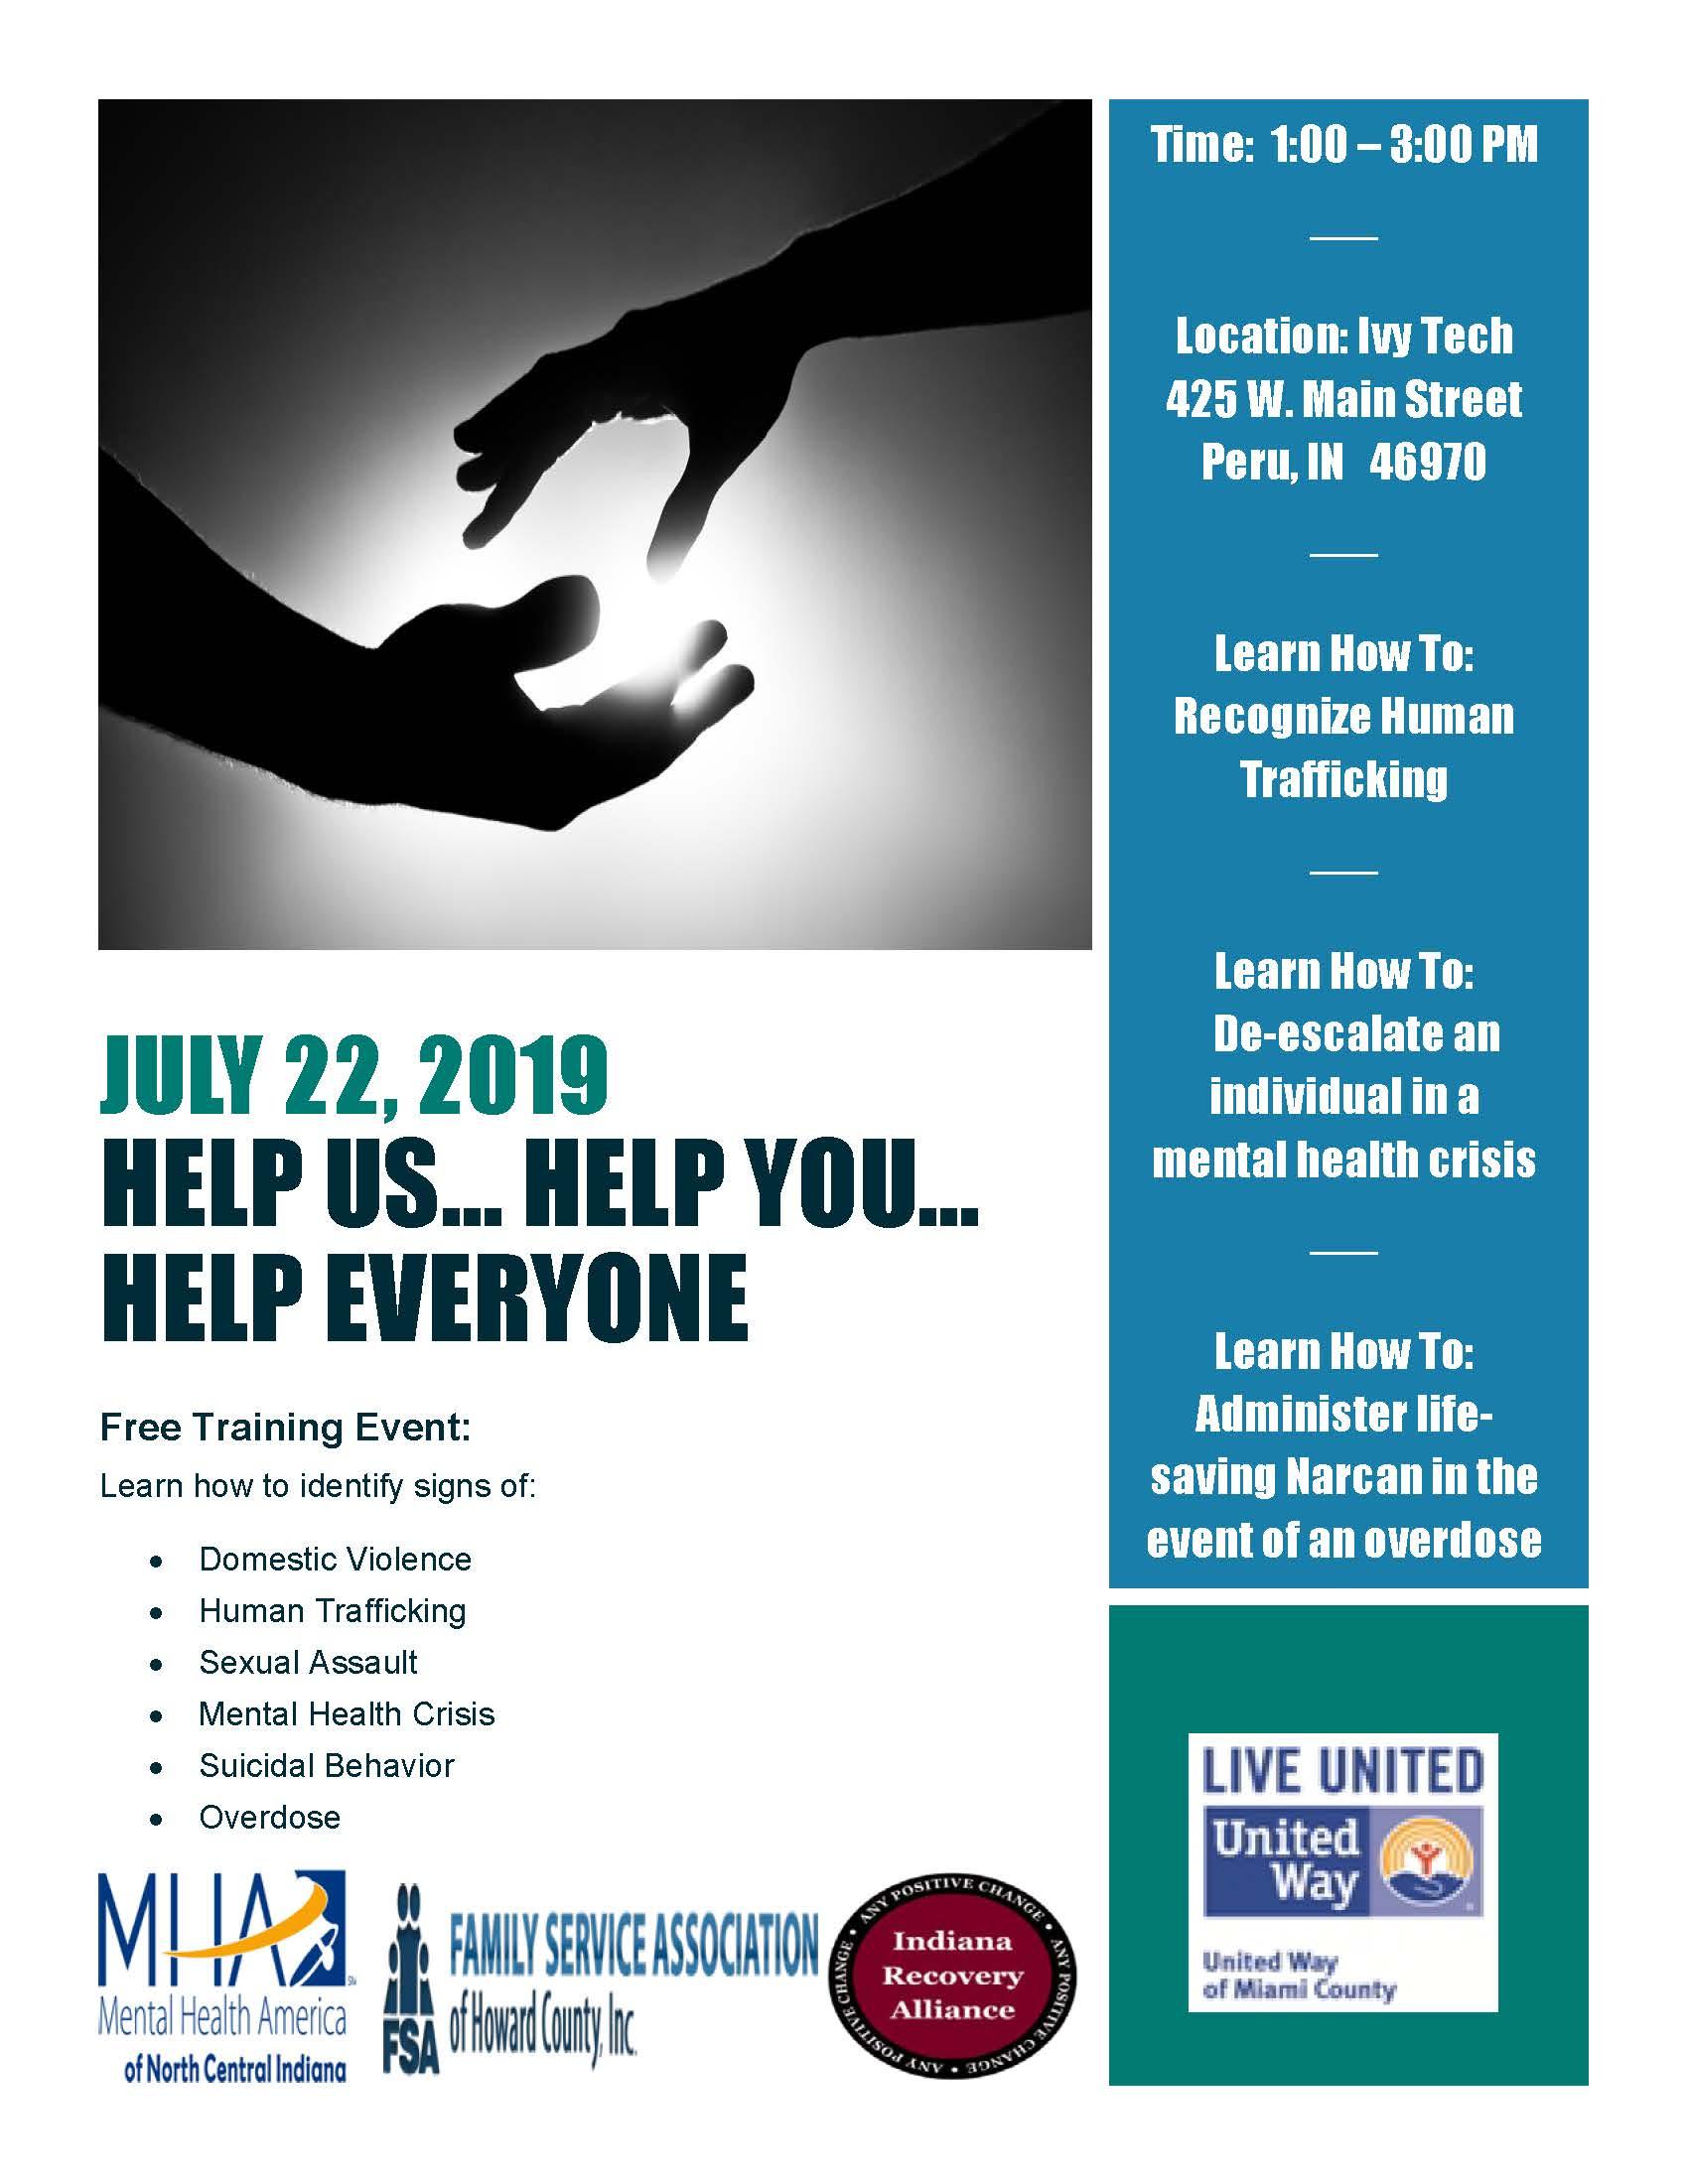 Help Us Help You Help Everyone - Free Training